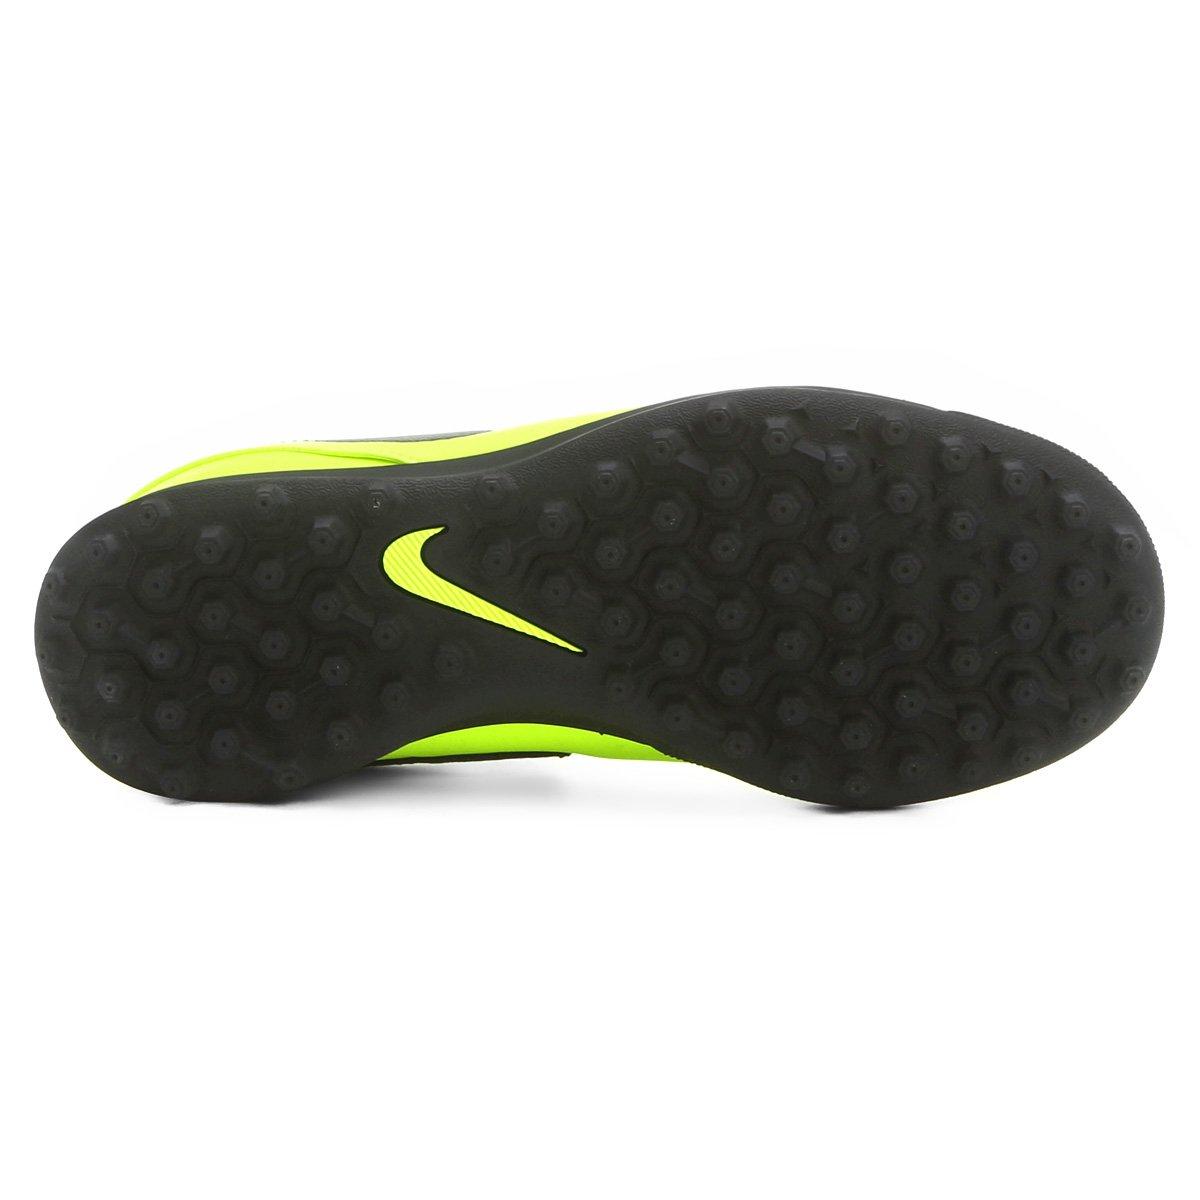 Chuteira Society Infantil Nike Tiempo Rio 3 TF - Compre Agora  c379fe89419b0